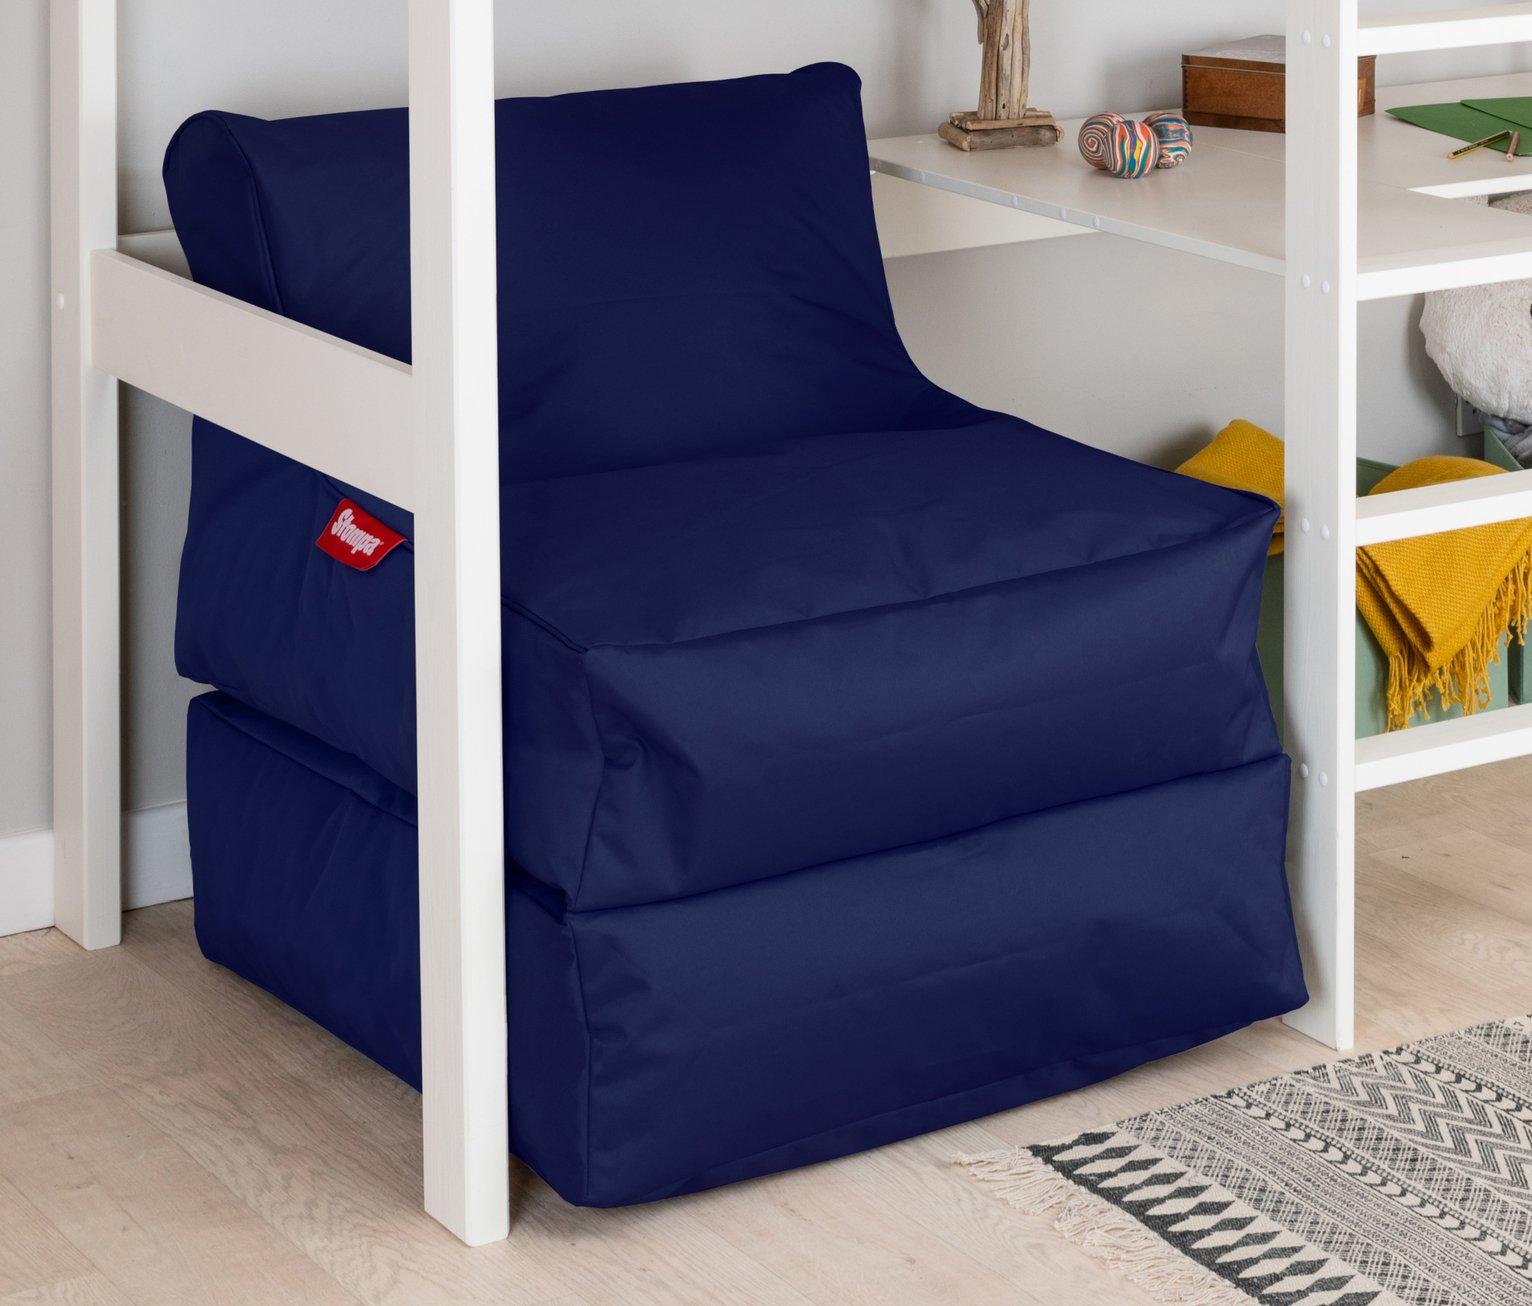 Stompa XL Flexi Sleep Lounger Beanbag - Navy